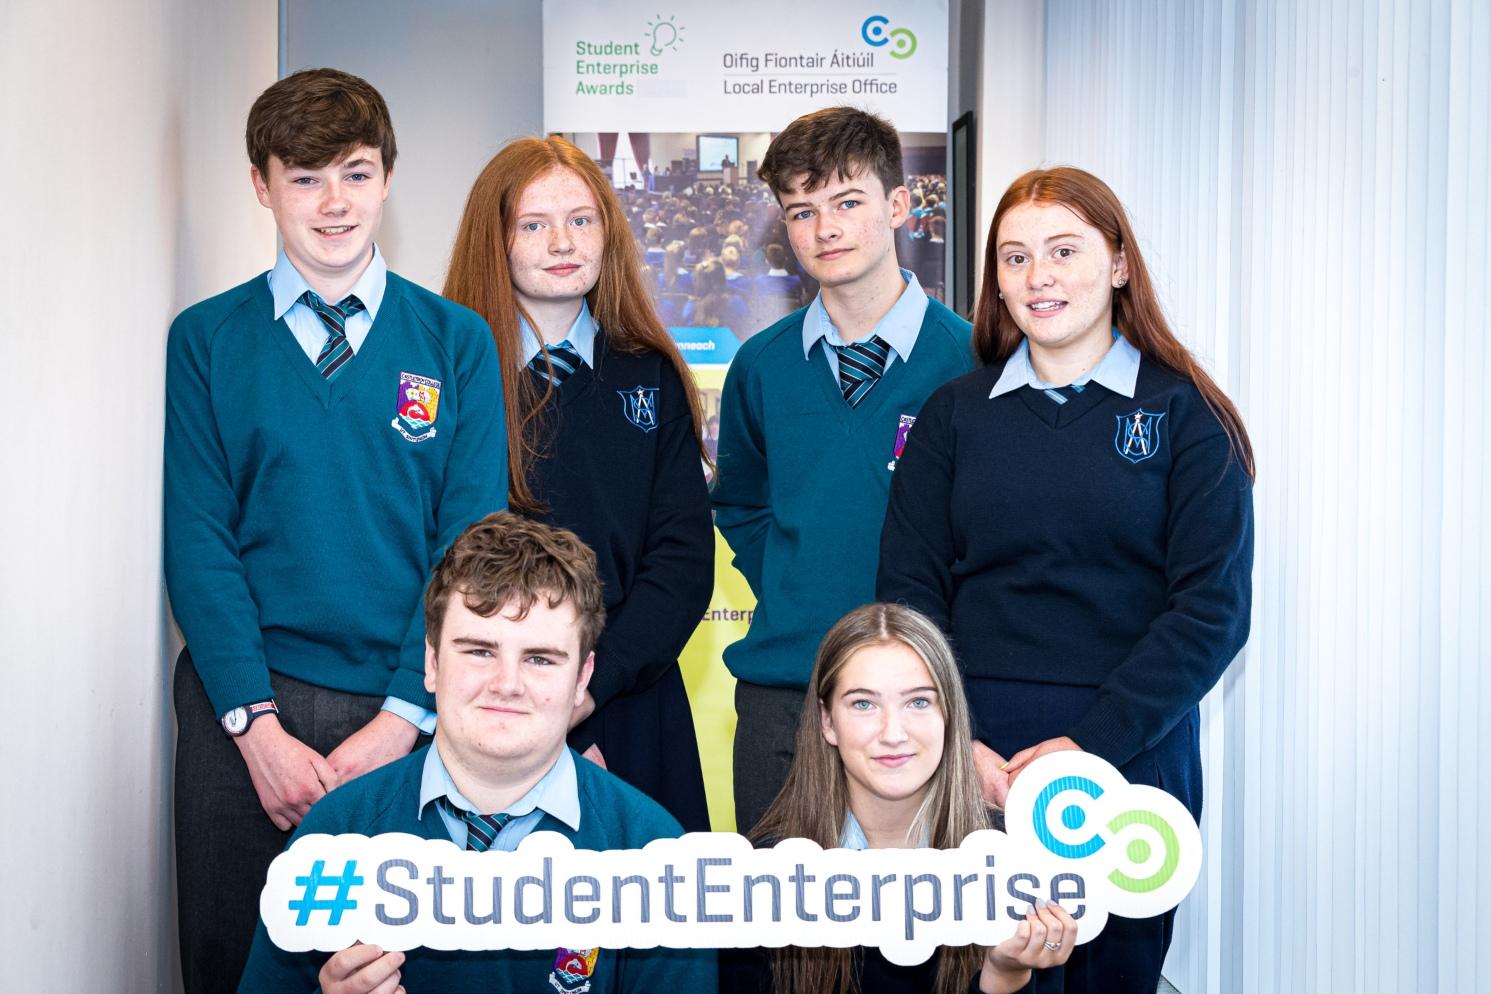 Student Enterprise Programme 2019